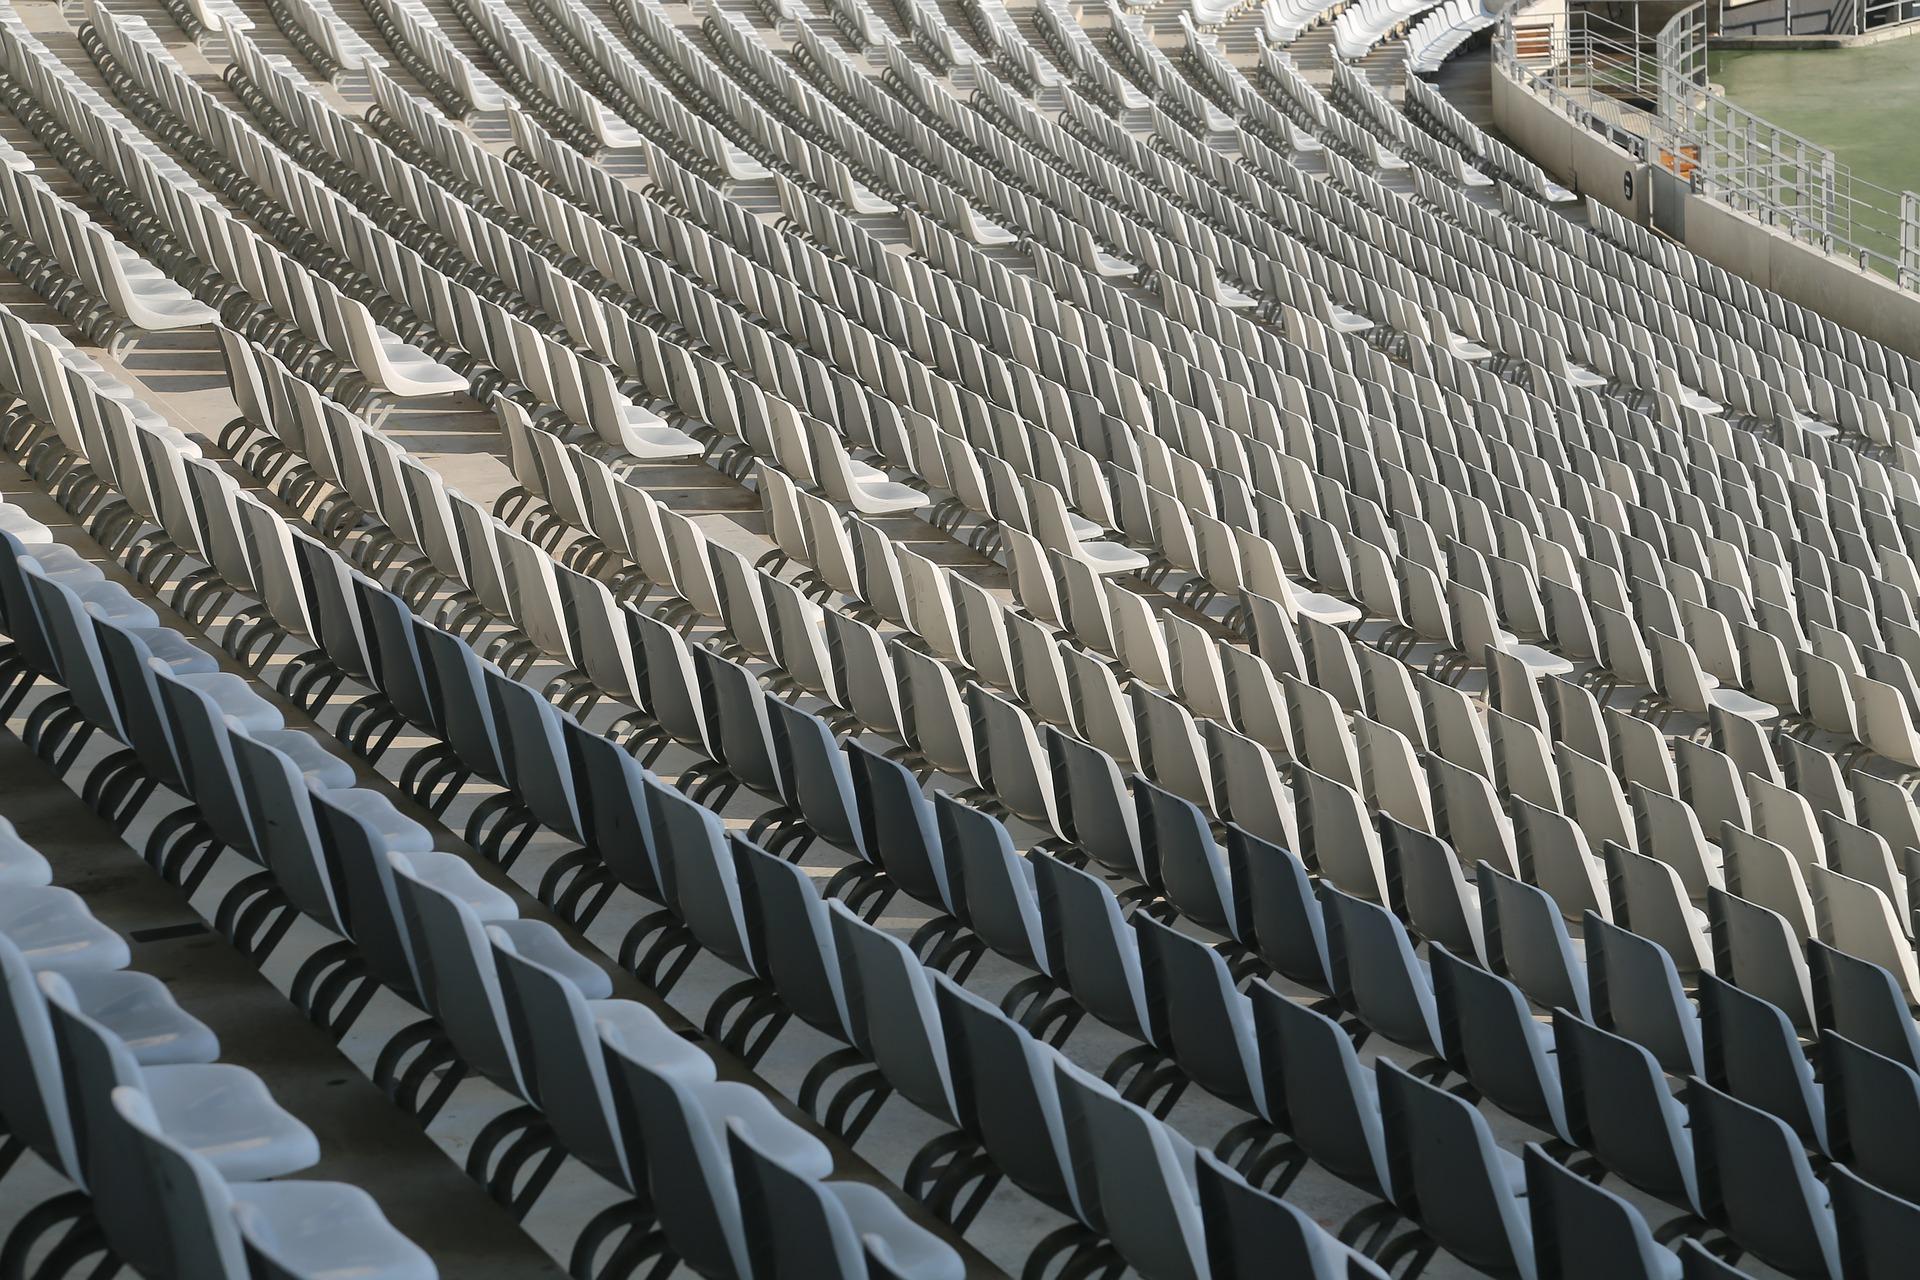 rows-of-seats-545595_1920.jpg